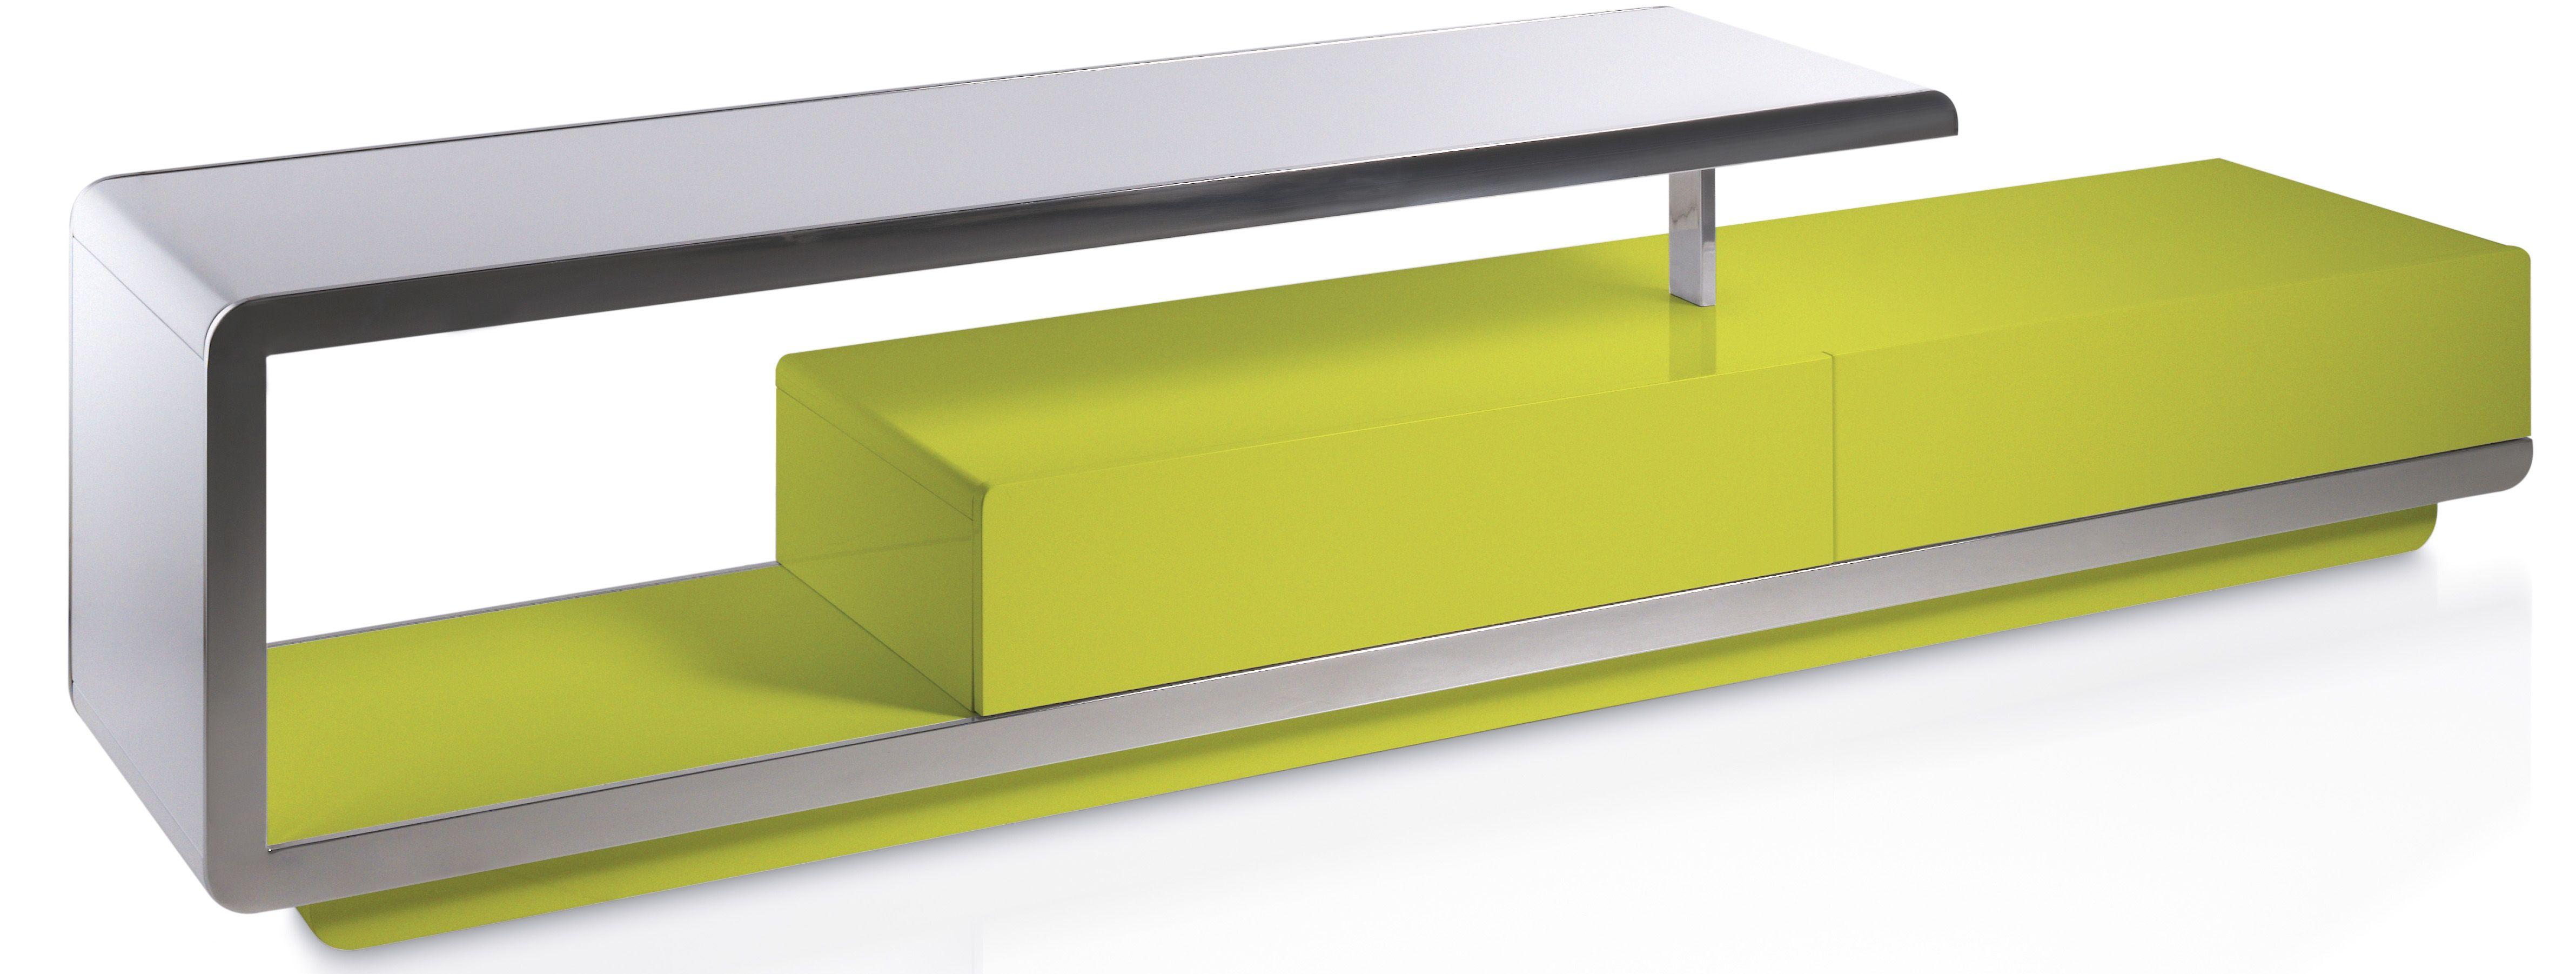 Designer Meuble Tv Design 2 Tiroirs Bois Laque Jaune Et Acier Chrome Modena Lestendances Fr Meuble Tv Design Meuble Tv Meuble